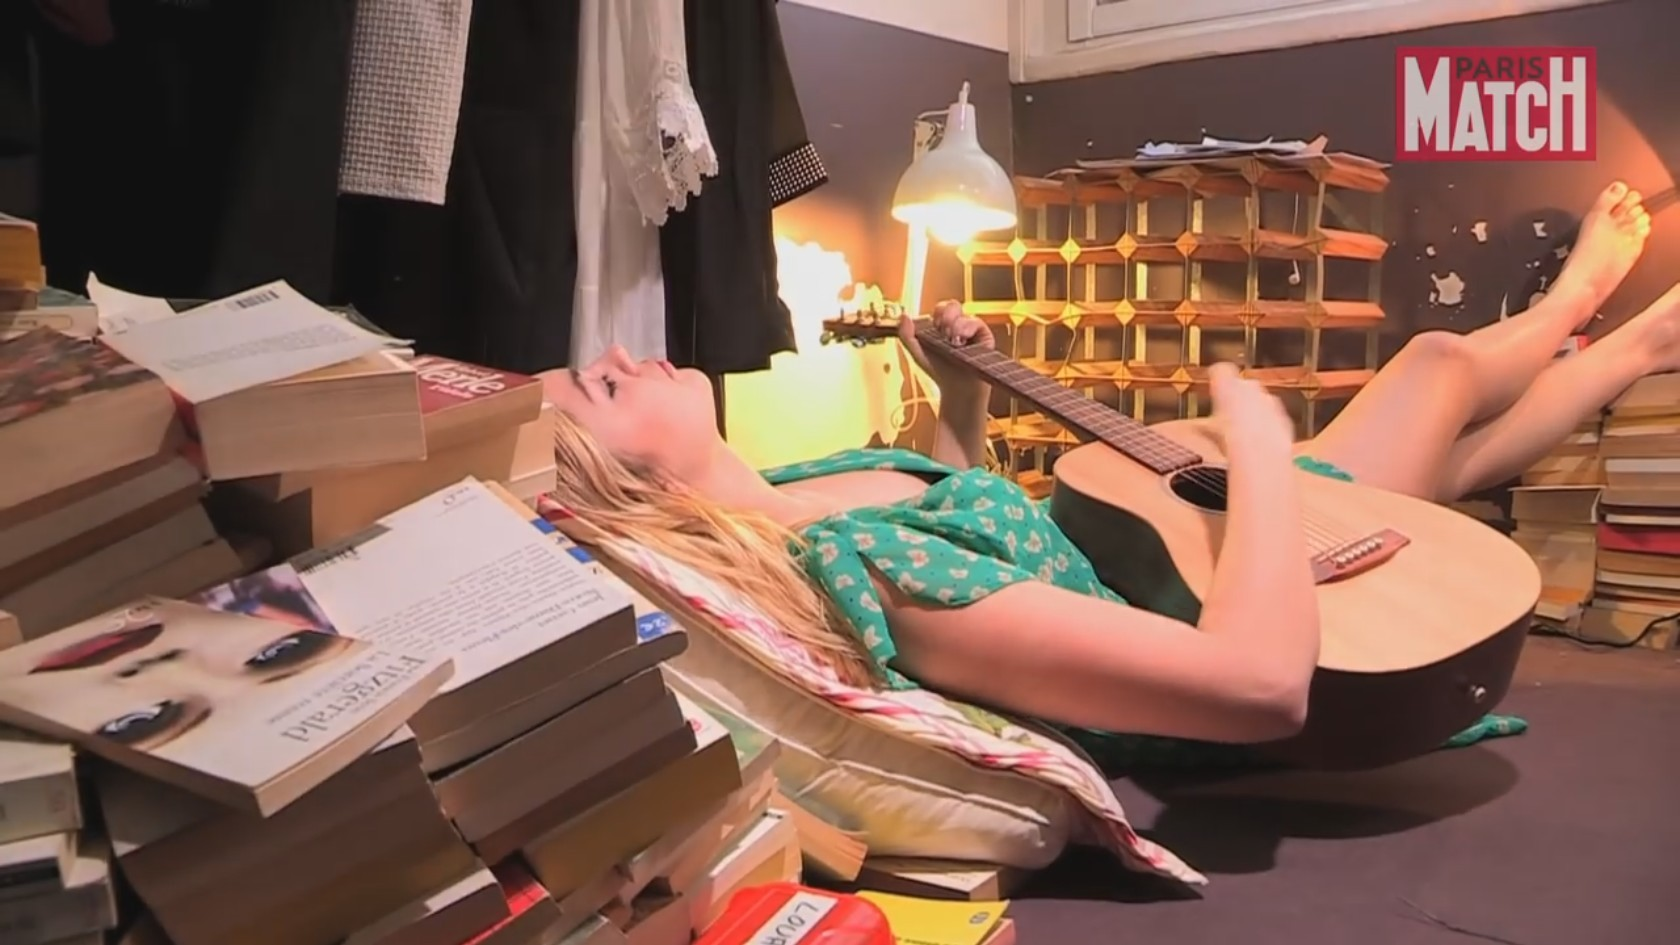 Feet Louane Emera nudes (57 photos), Tits, Paparazzi, Boobs, swimsuit 2006